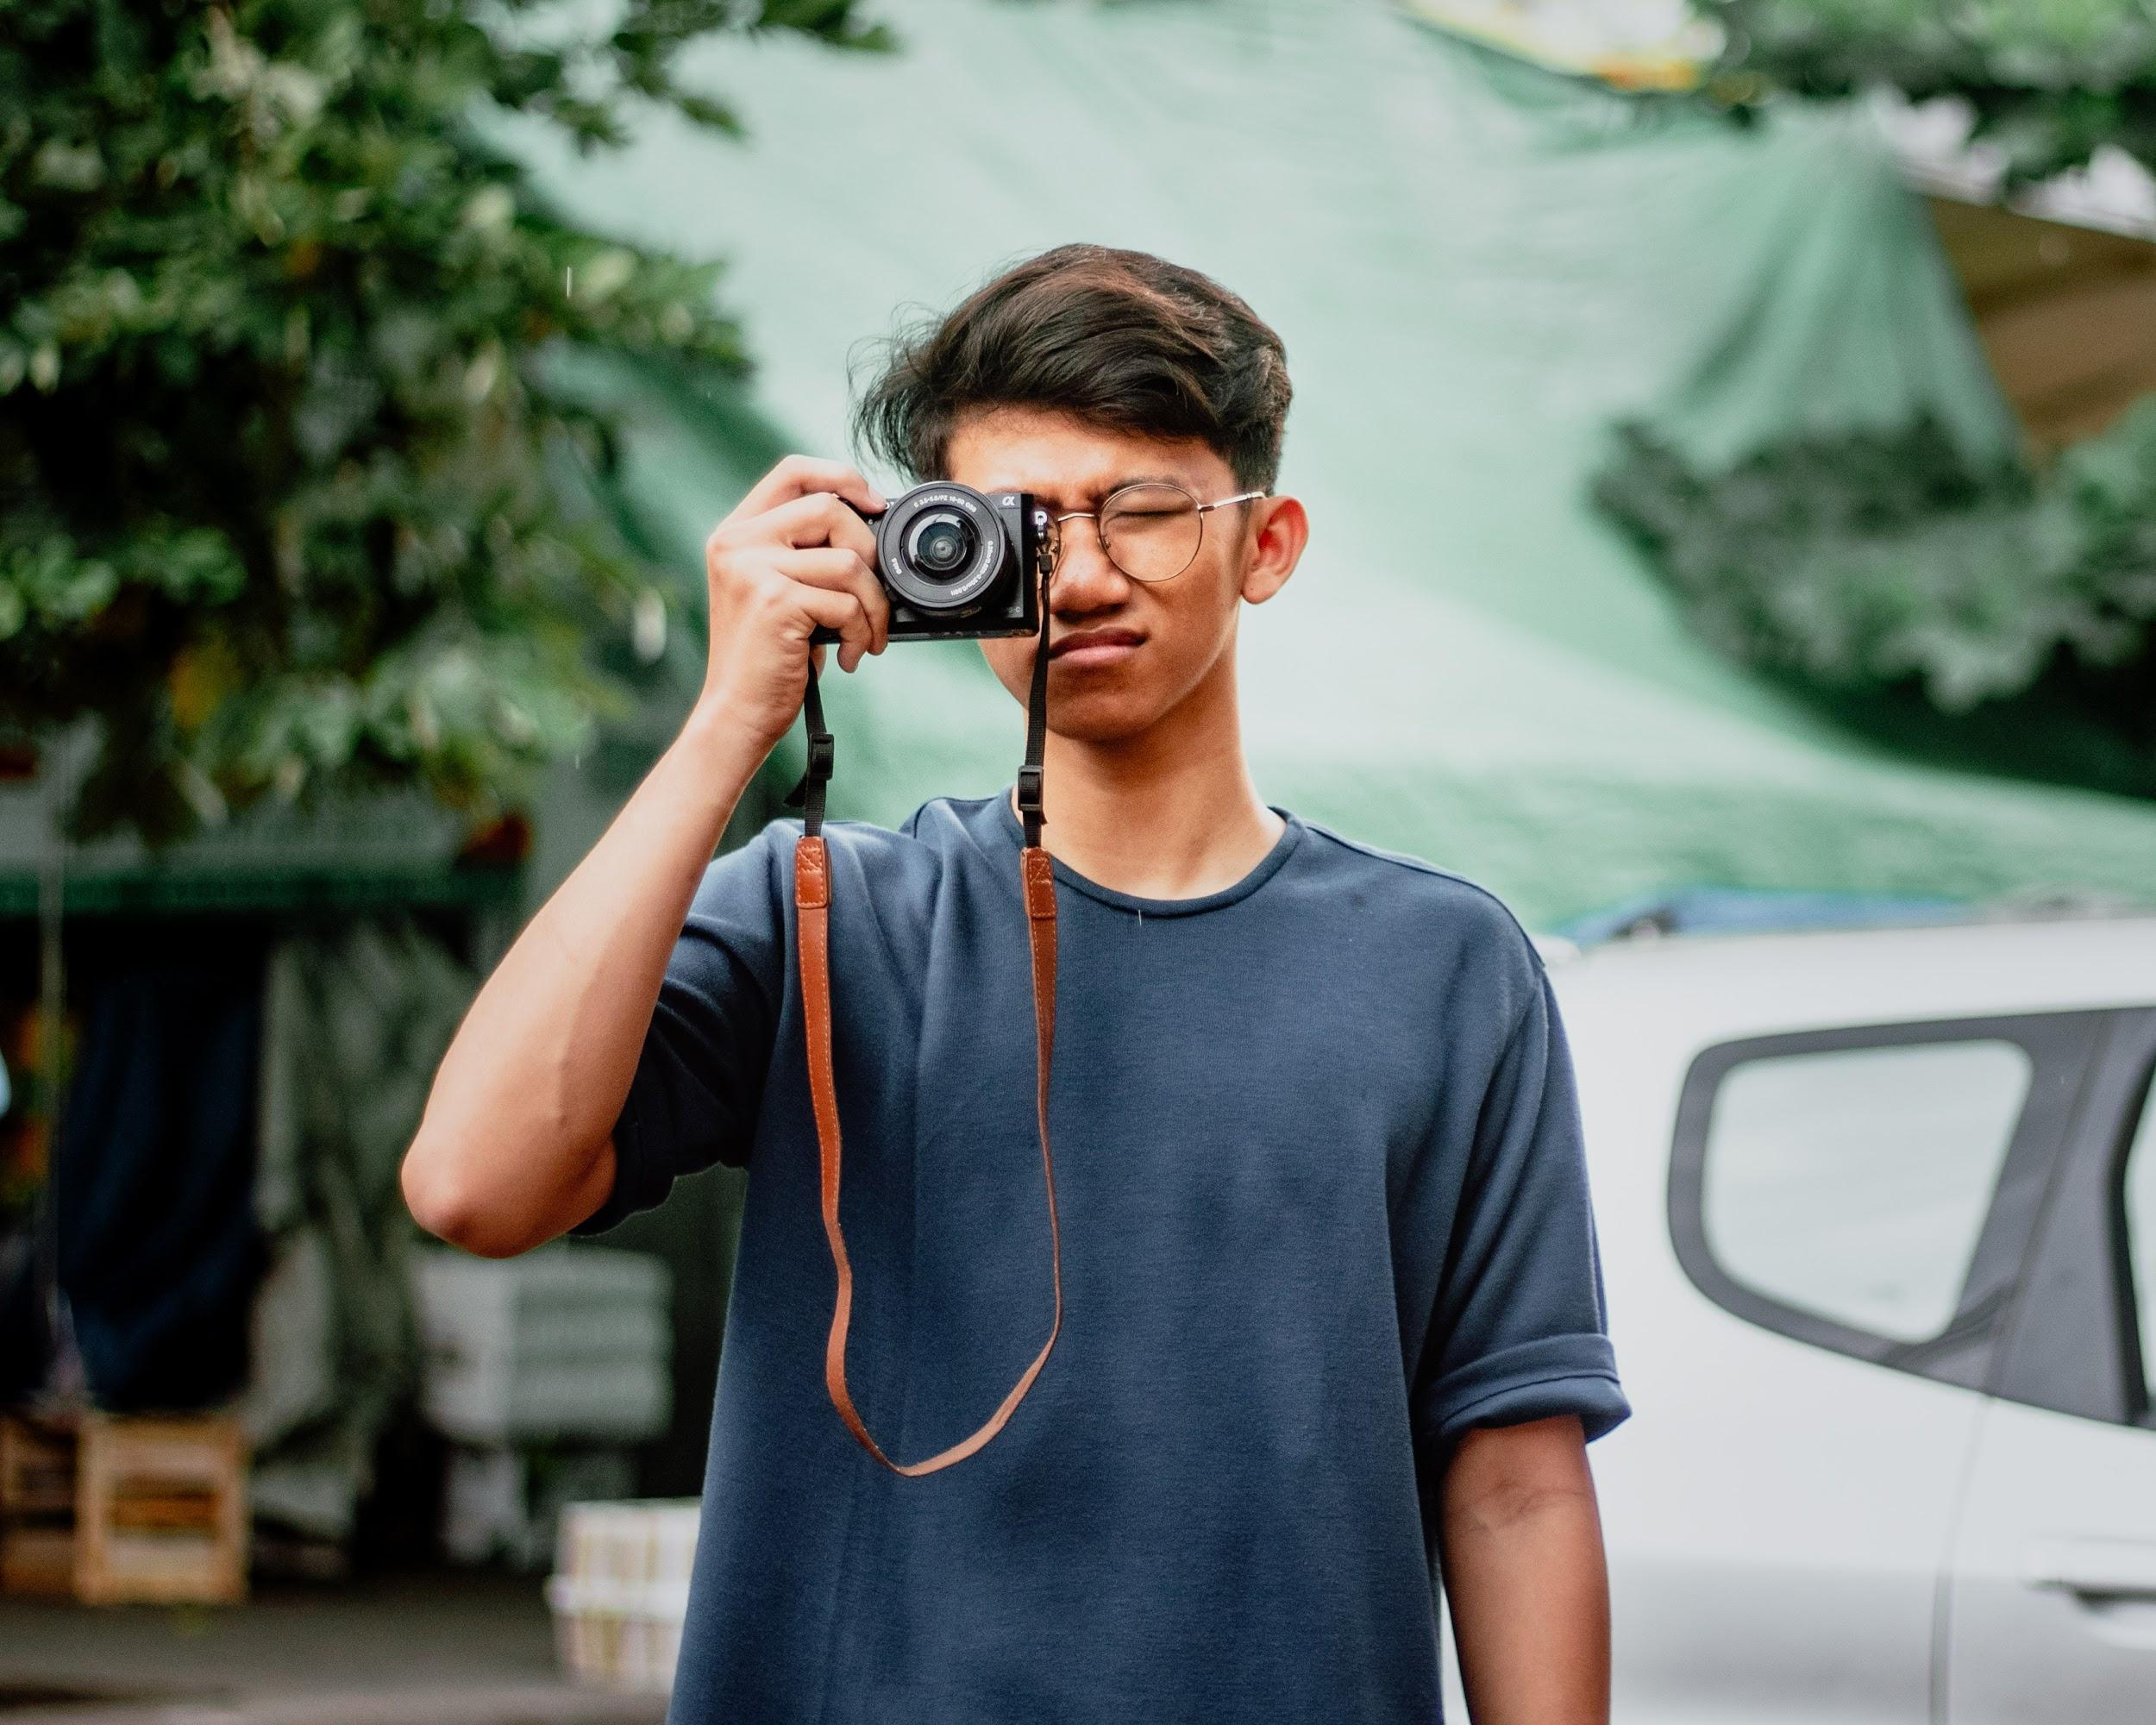 Money Making Tips for Photographers